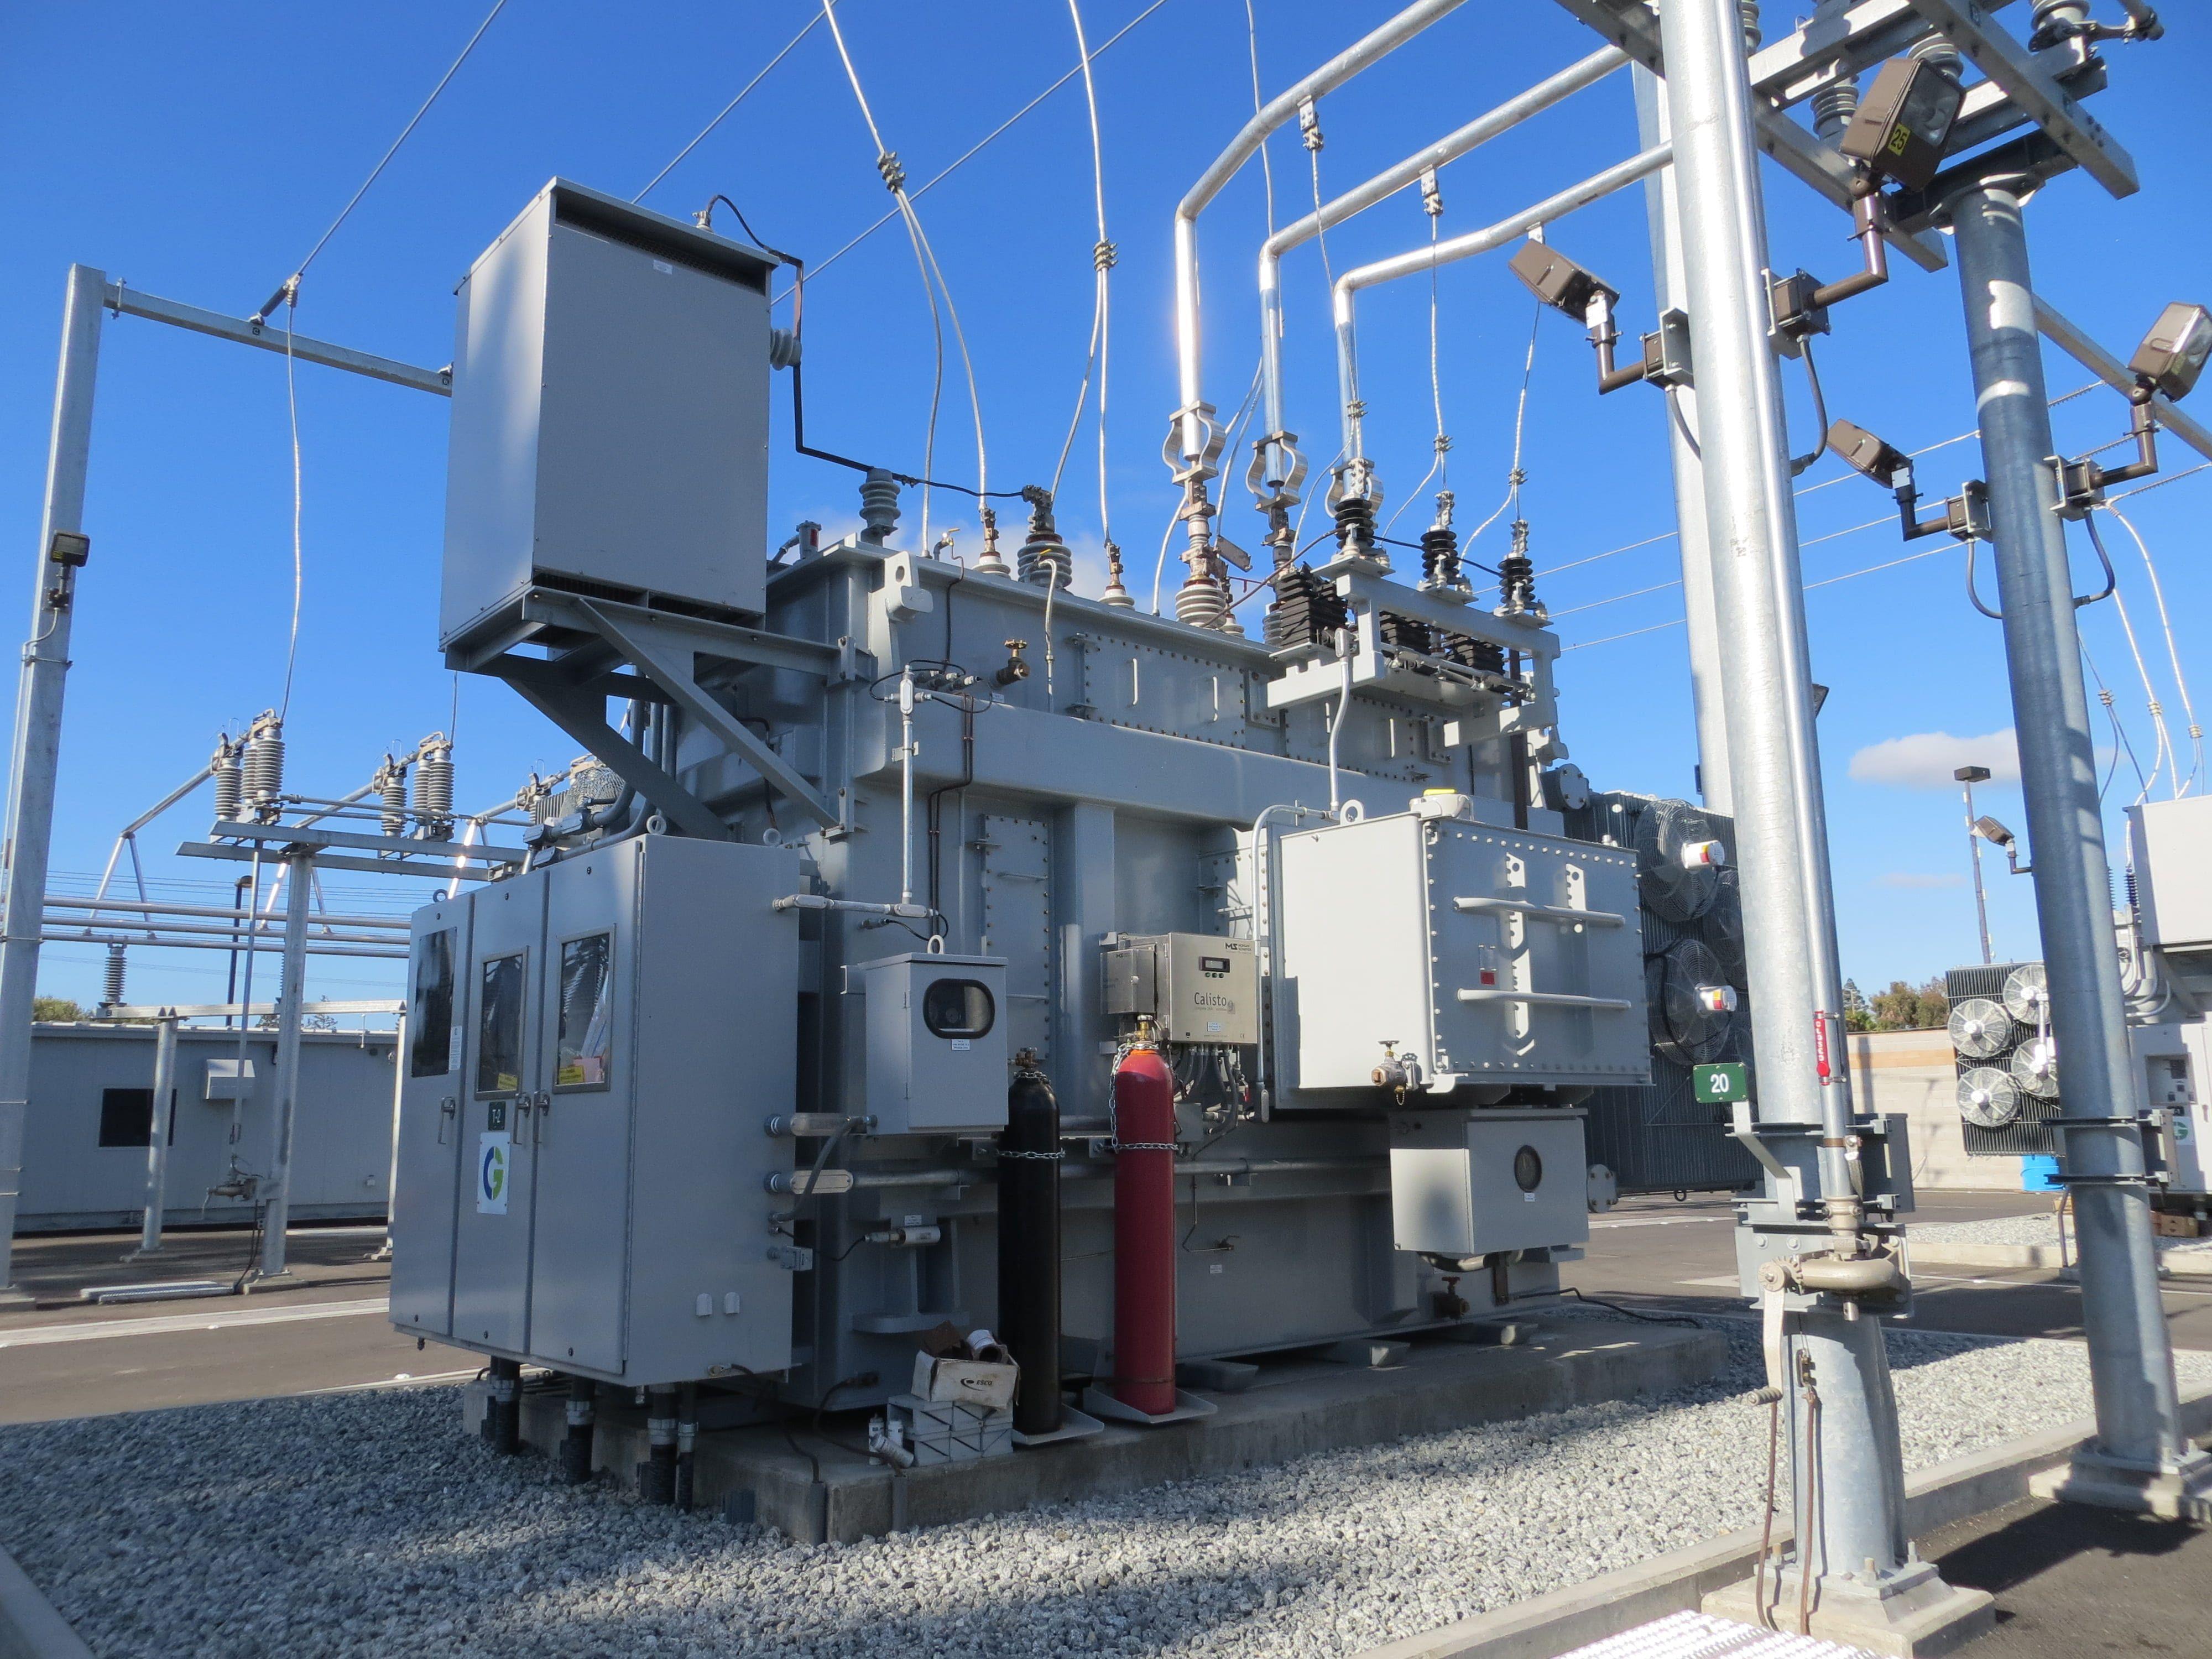 white electric power generator, white industrial machine